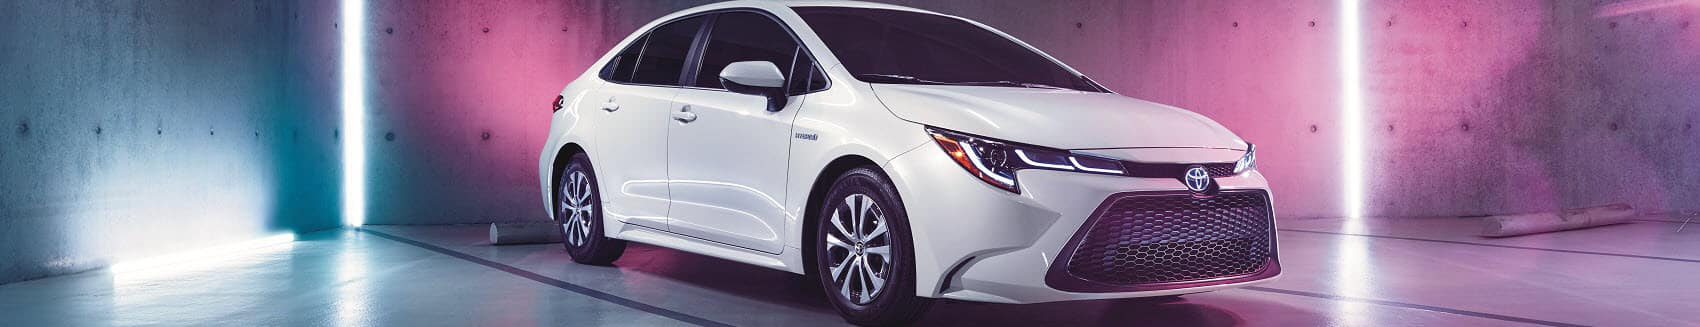 2020 Toyota Corolla MPG